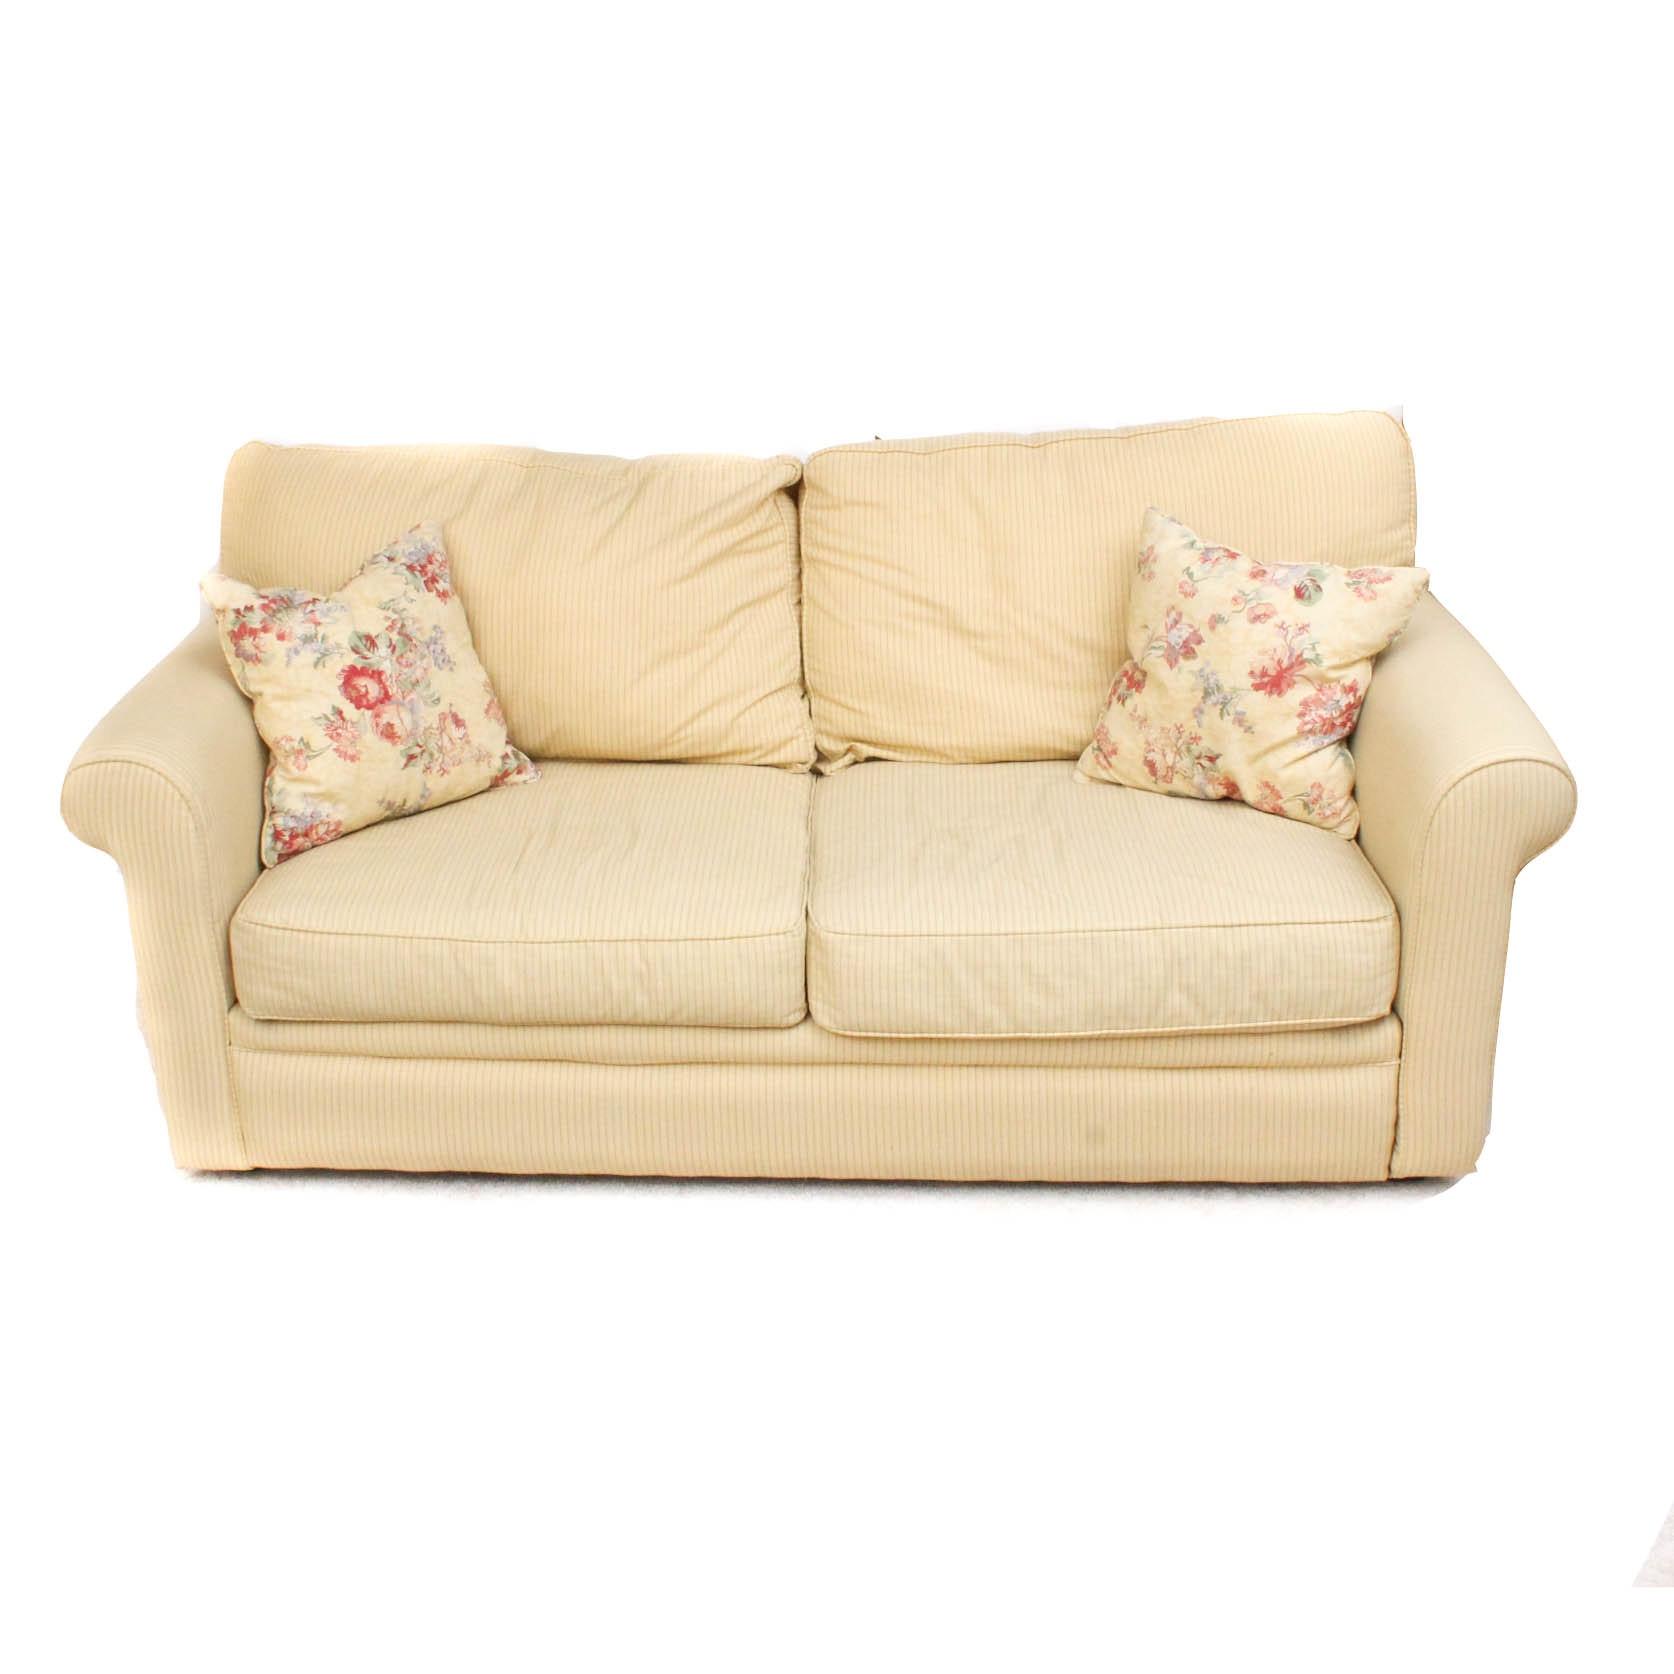 Contemporary Upholstered Sleeper Sofa